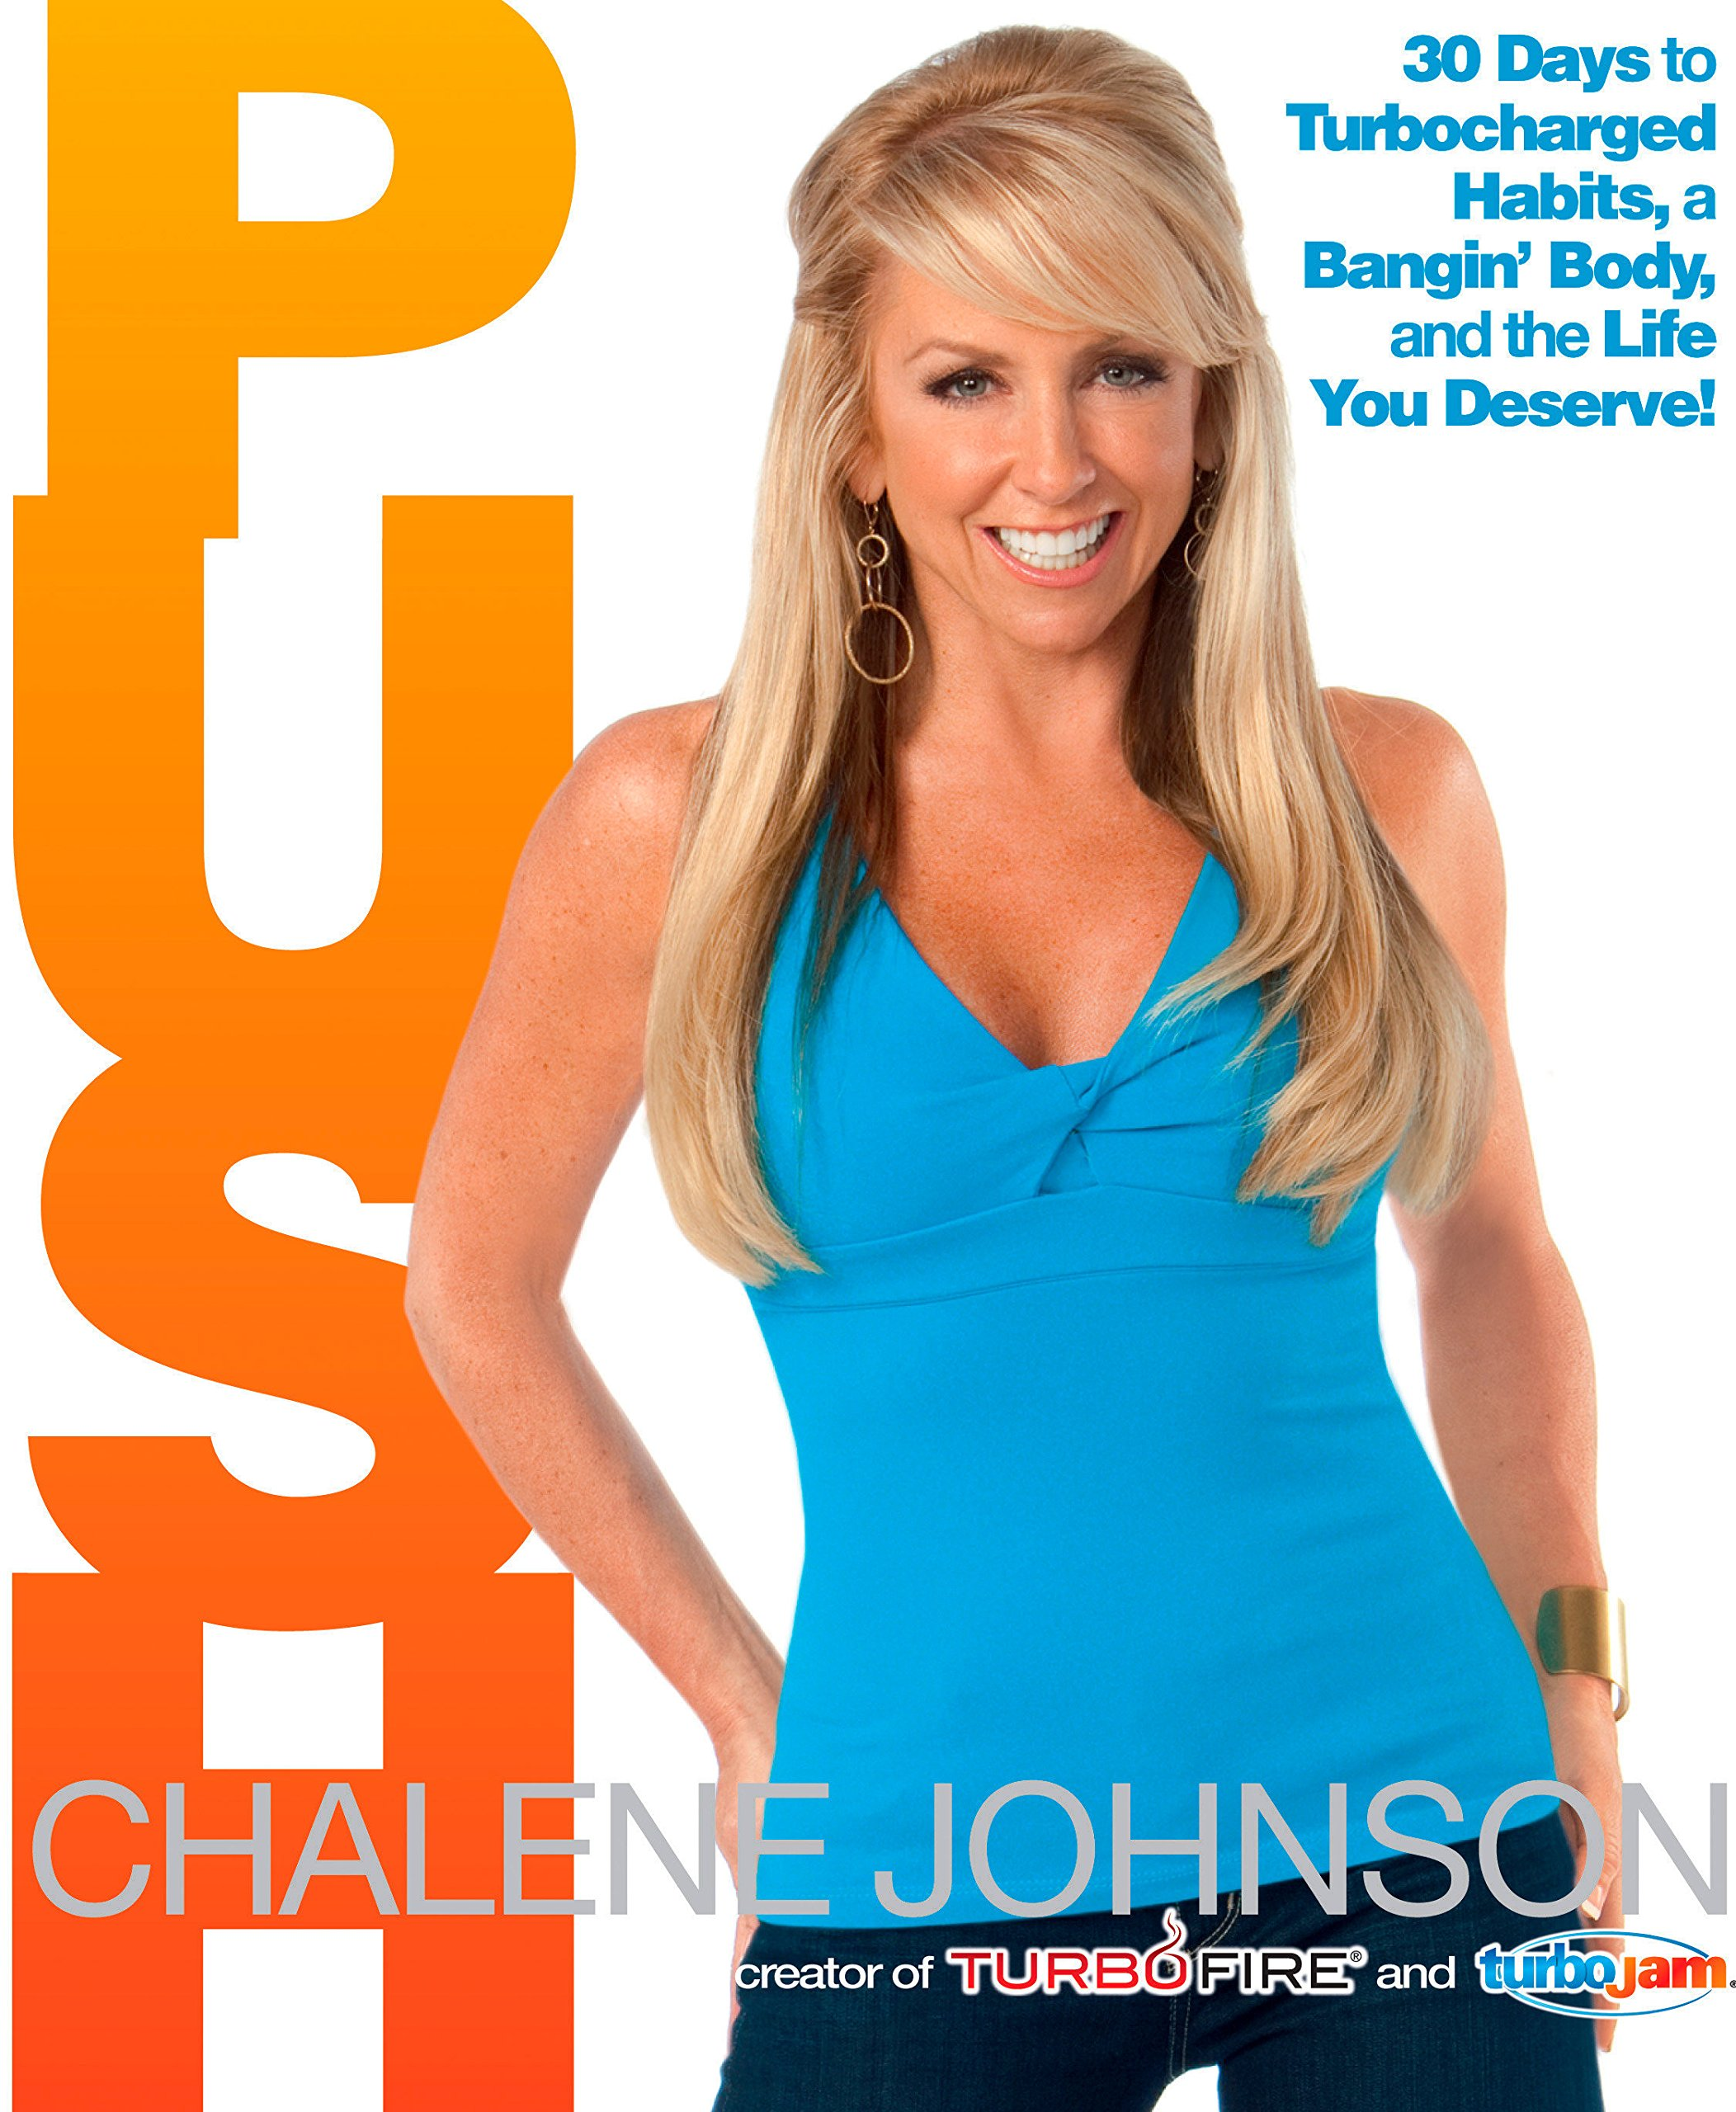 Push by chalene johnson pdf